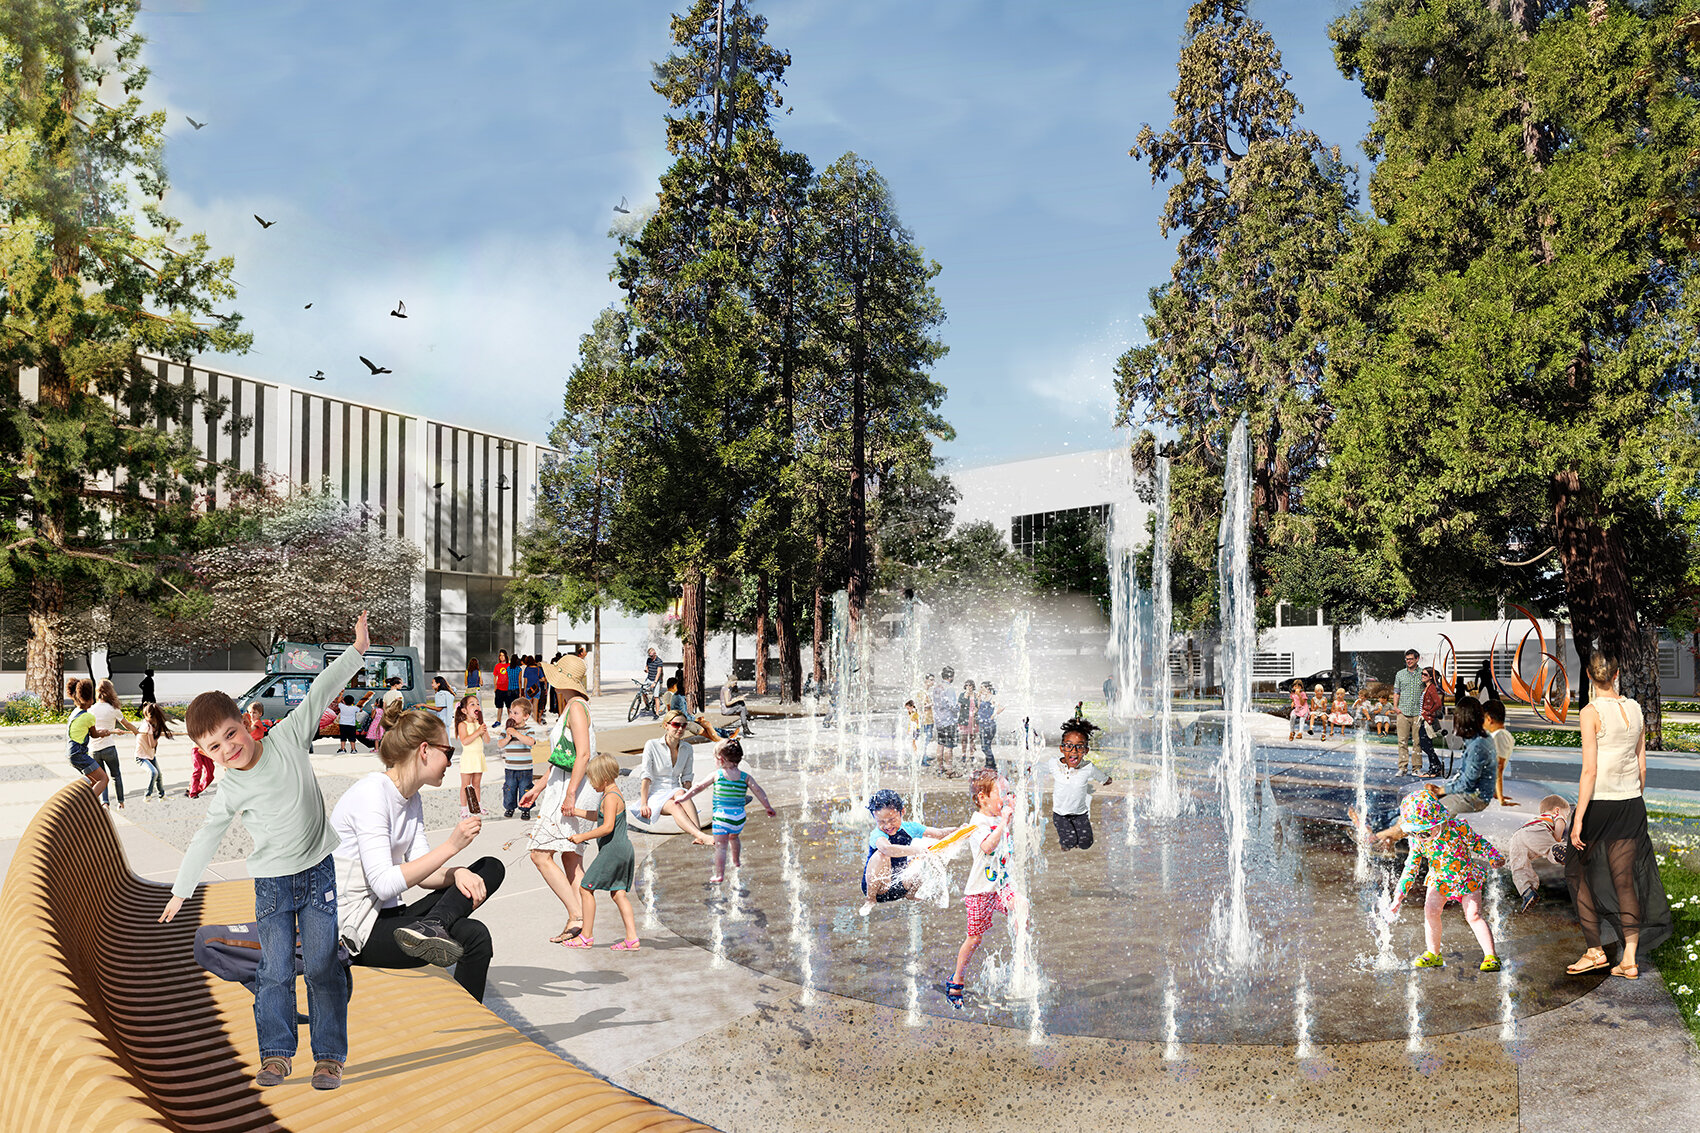 Town Square splash pad